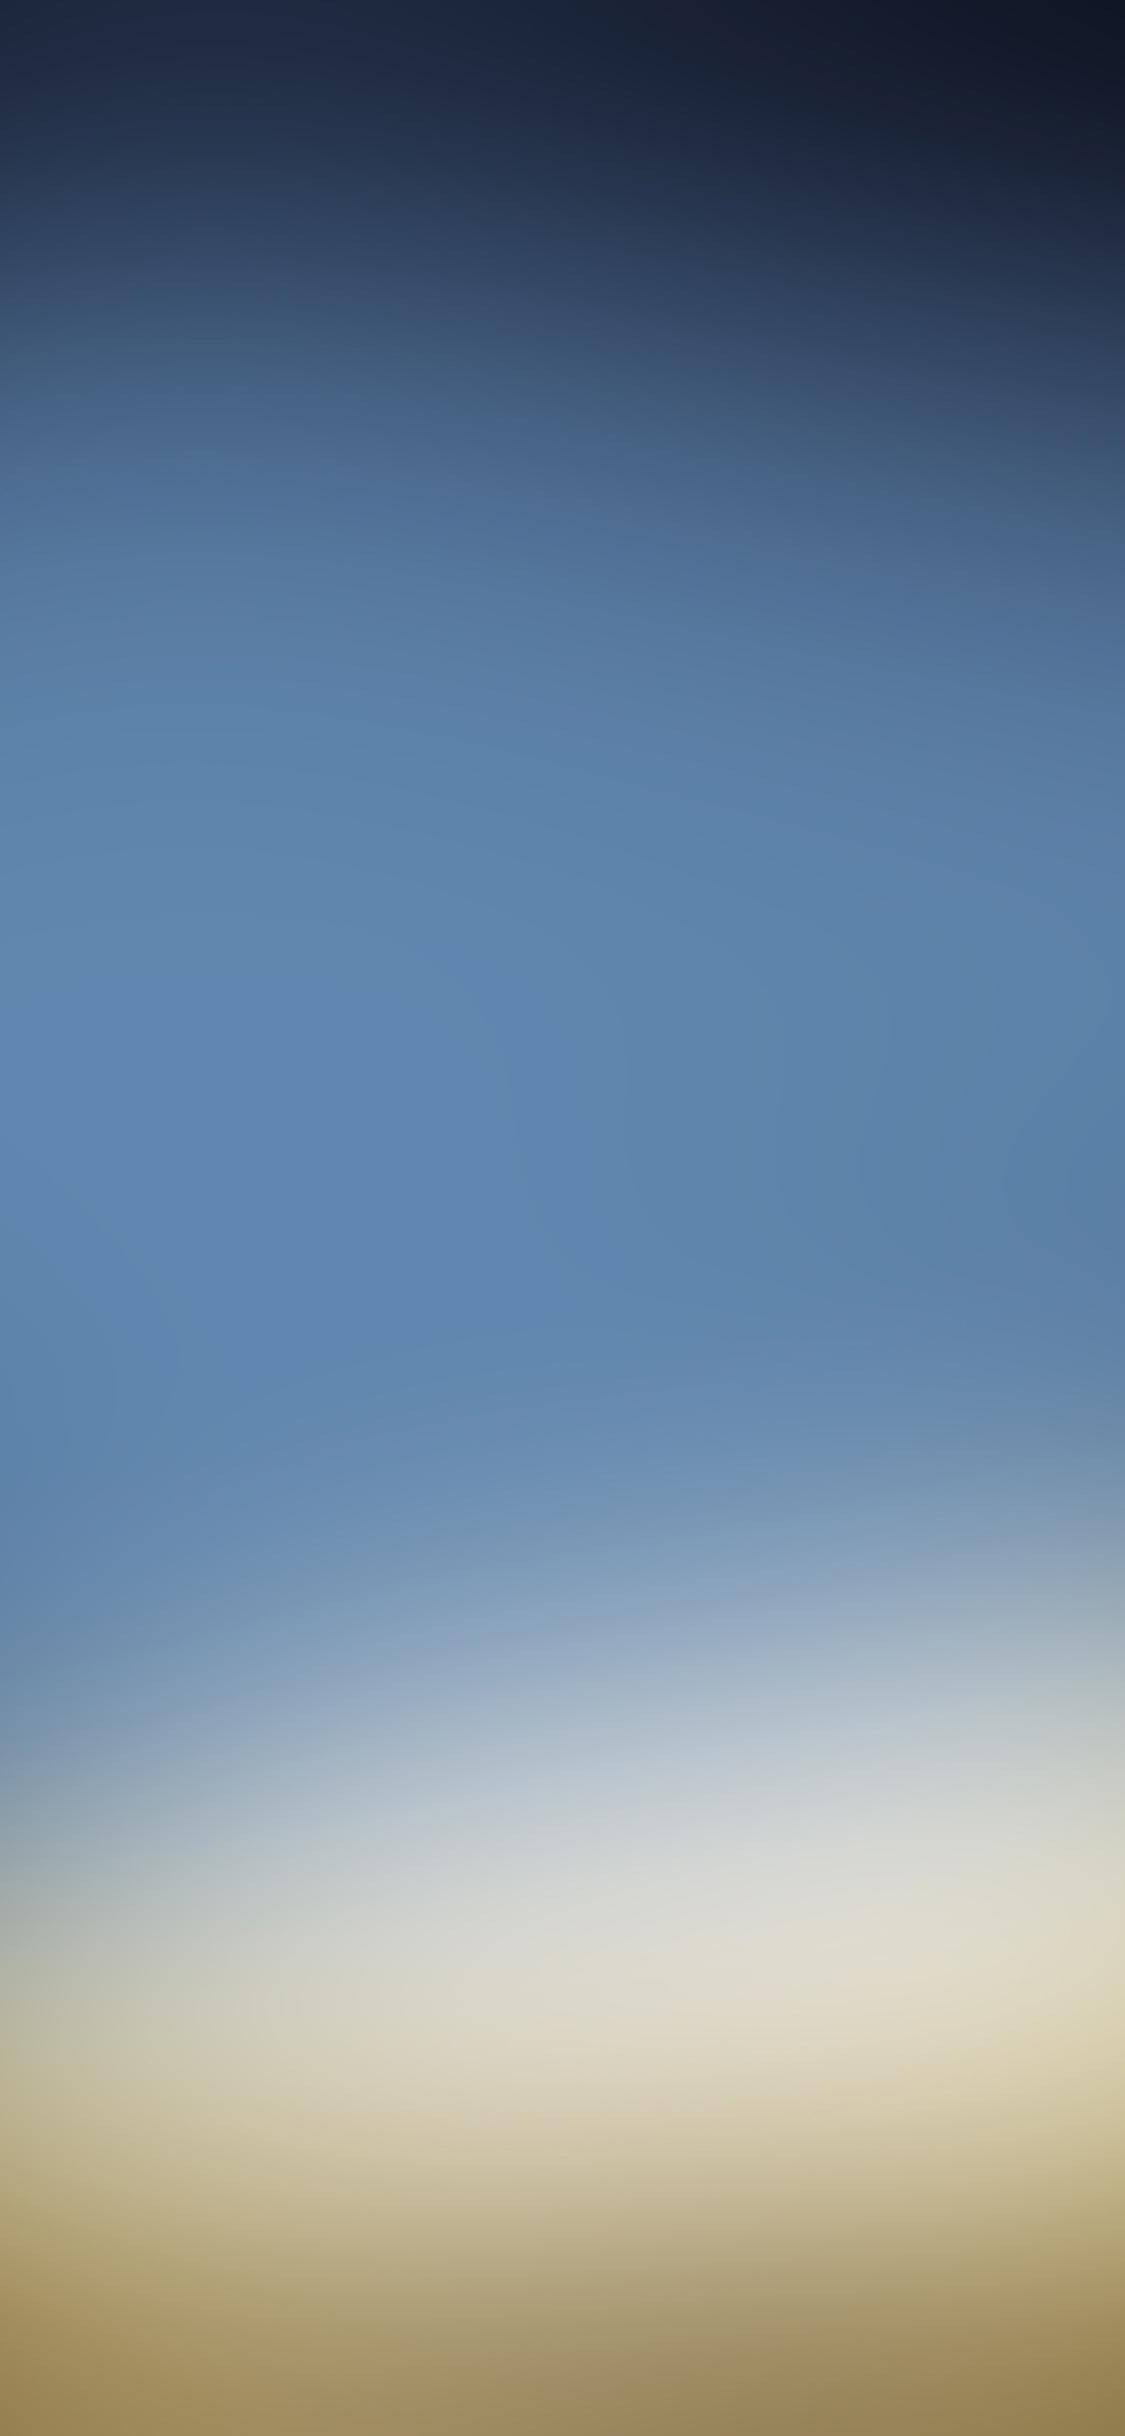 iPhoneXpapers.com-Apple-iPhone-wallpaper-sa77-wallpaper-sky-cloud-alone-blur